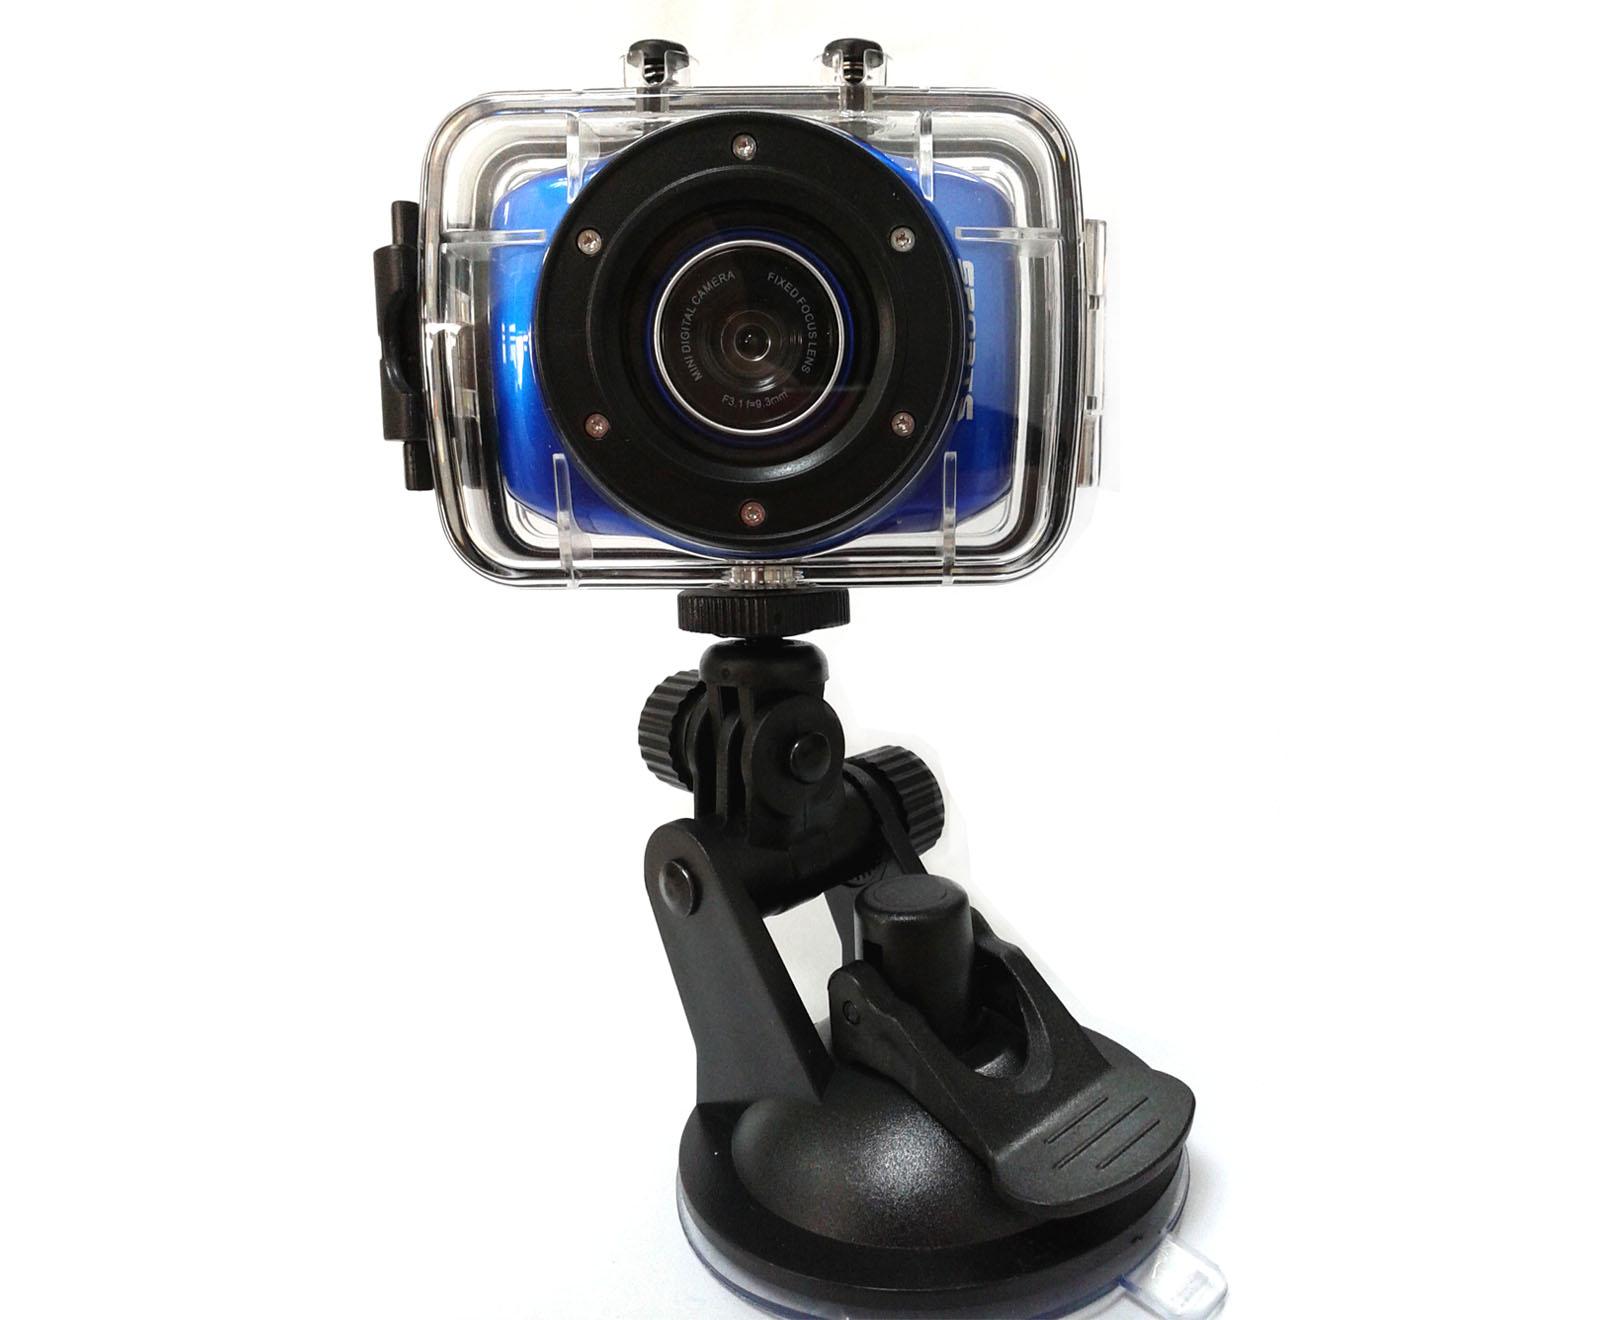 Sport camera Helmet Waterproof Action Camera DVR Camcorder Driving Recorder For Bike/Diving/Surfing/Ski/Skydiving HD 720P camera(China (Mainland))